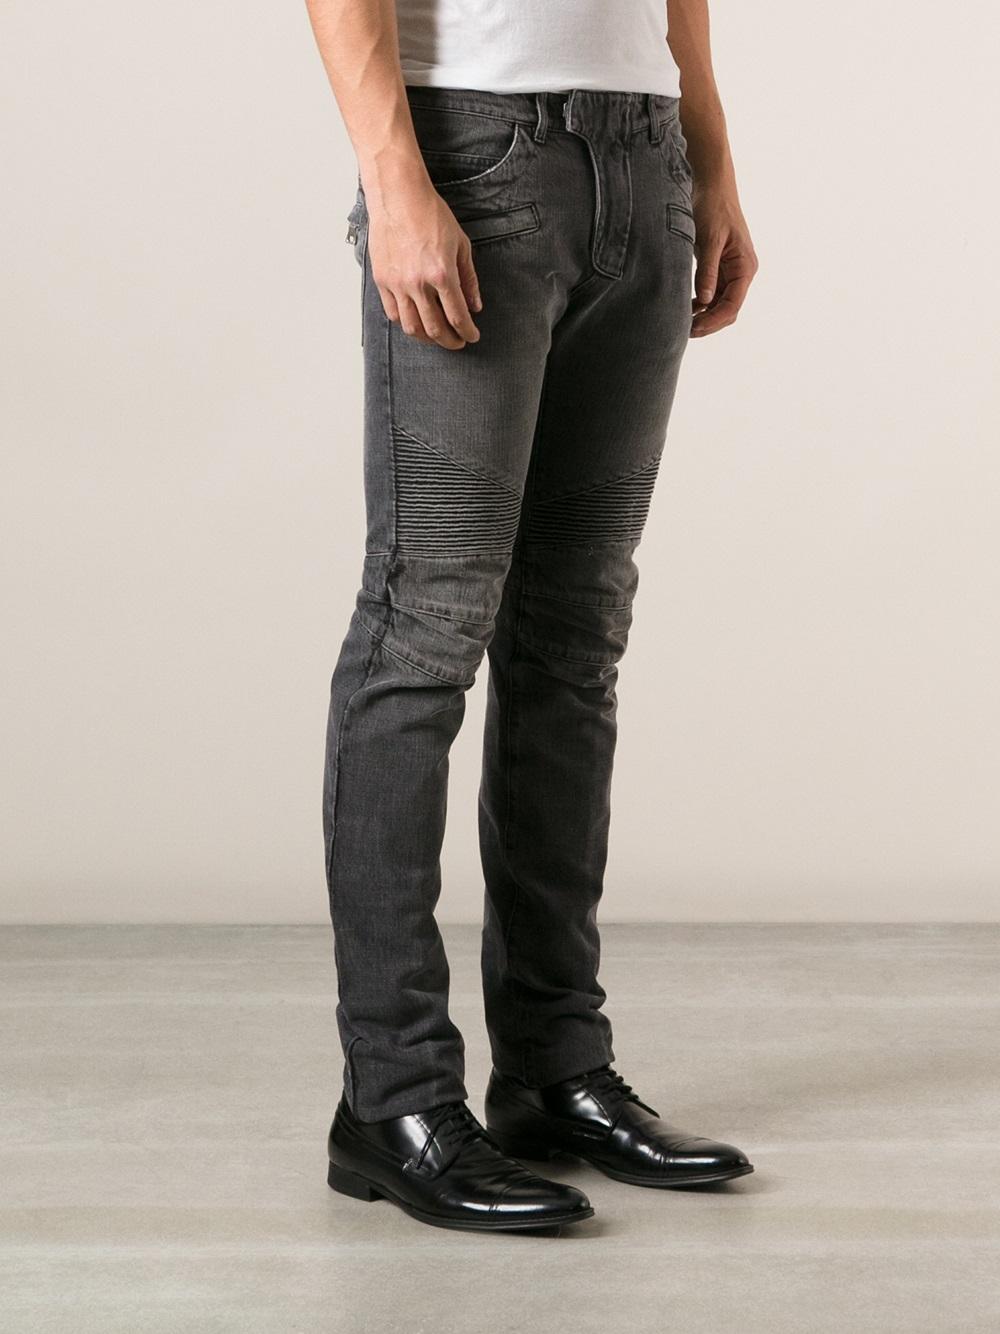 balmain moto skinny jeans in black for men lyst. Black Bedroom Furniture Sets. Home Design Ideas